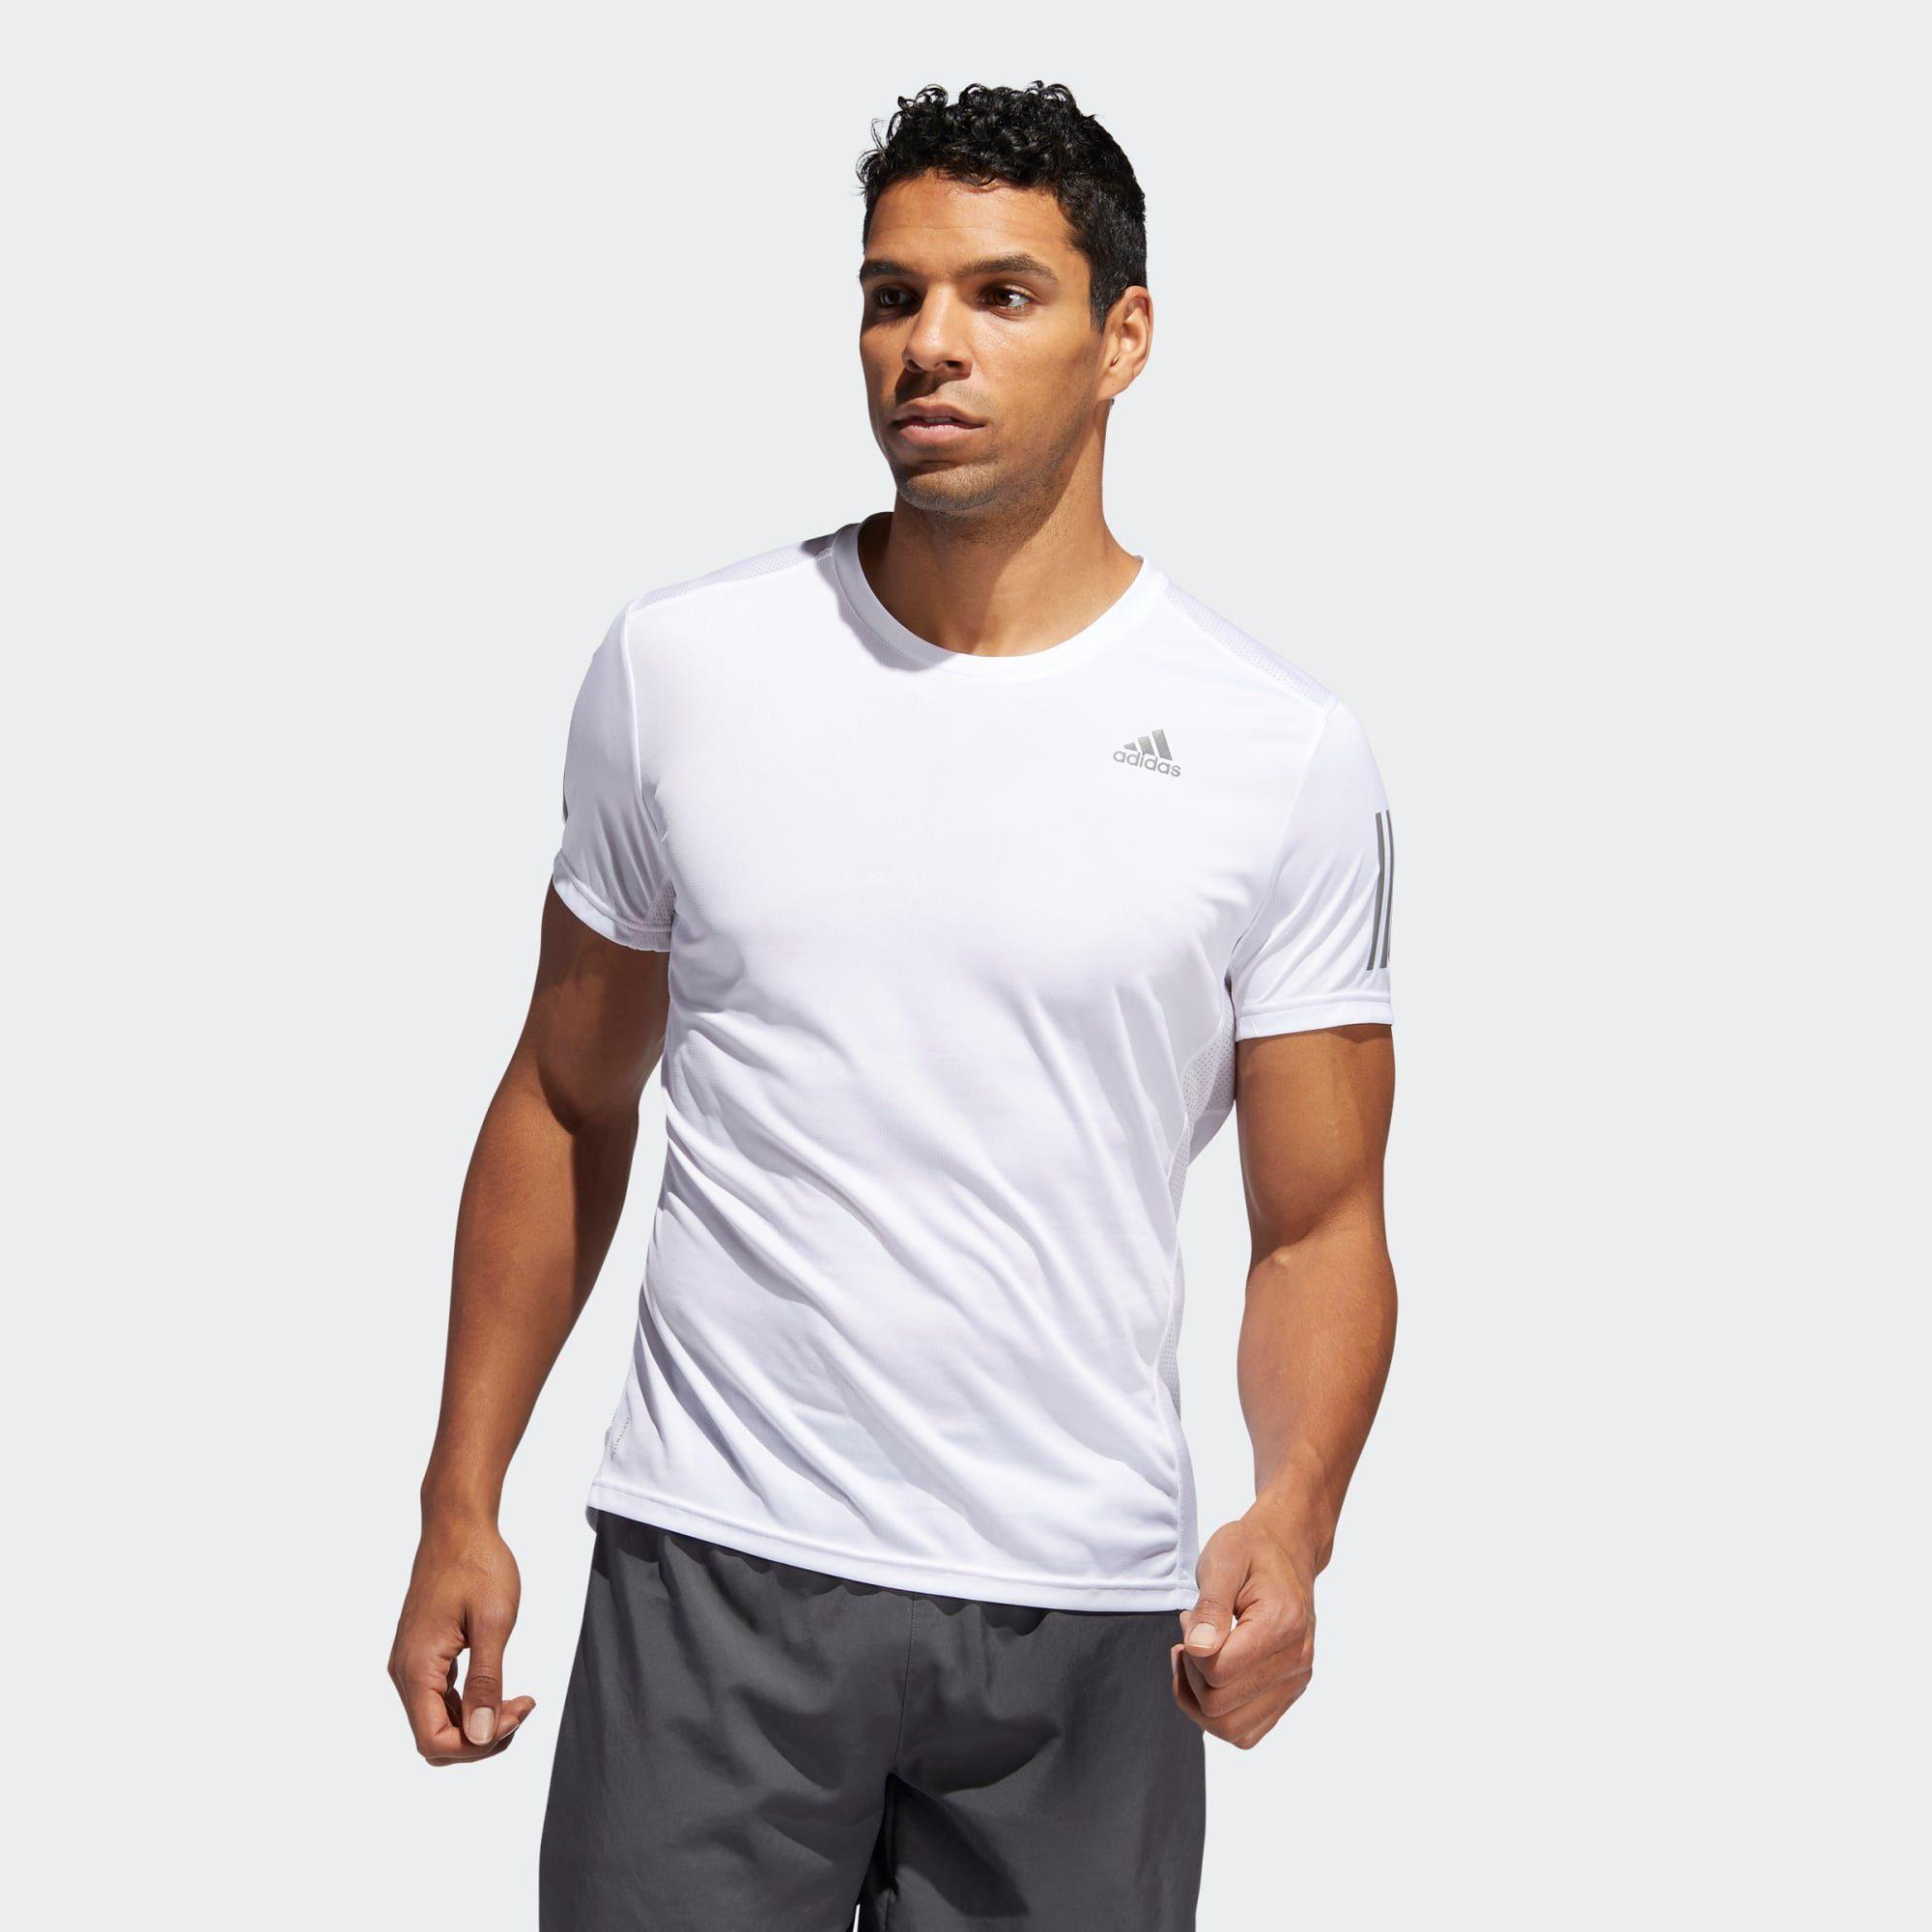 adidas Performance T Shirt »Own the Run T Shirt« Response;Clima;READY online kaufen | OTTO